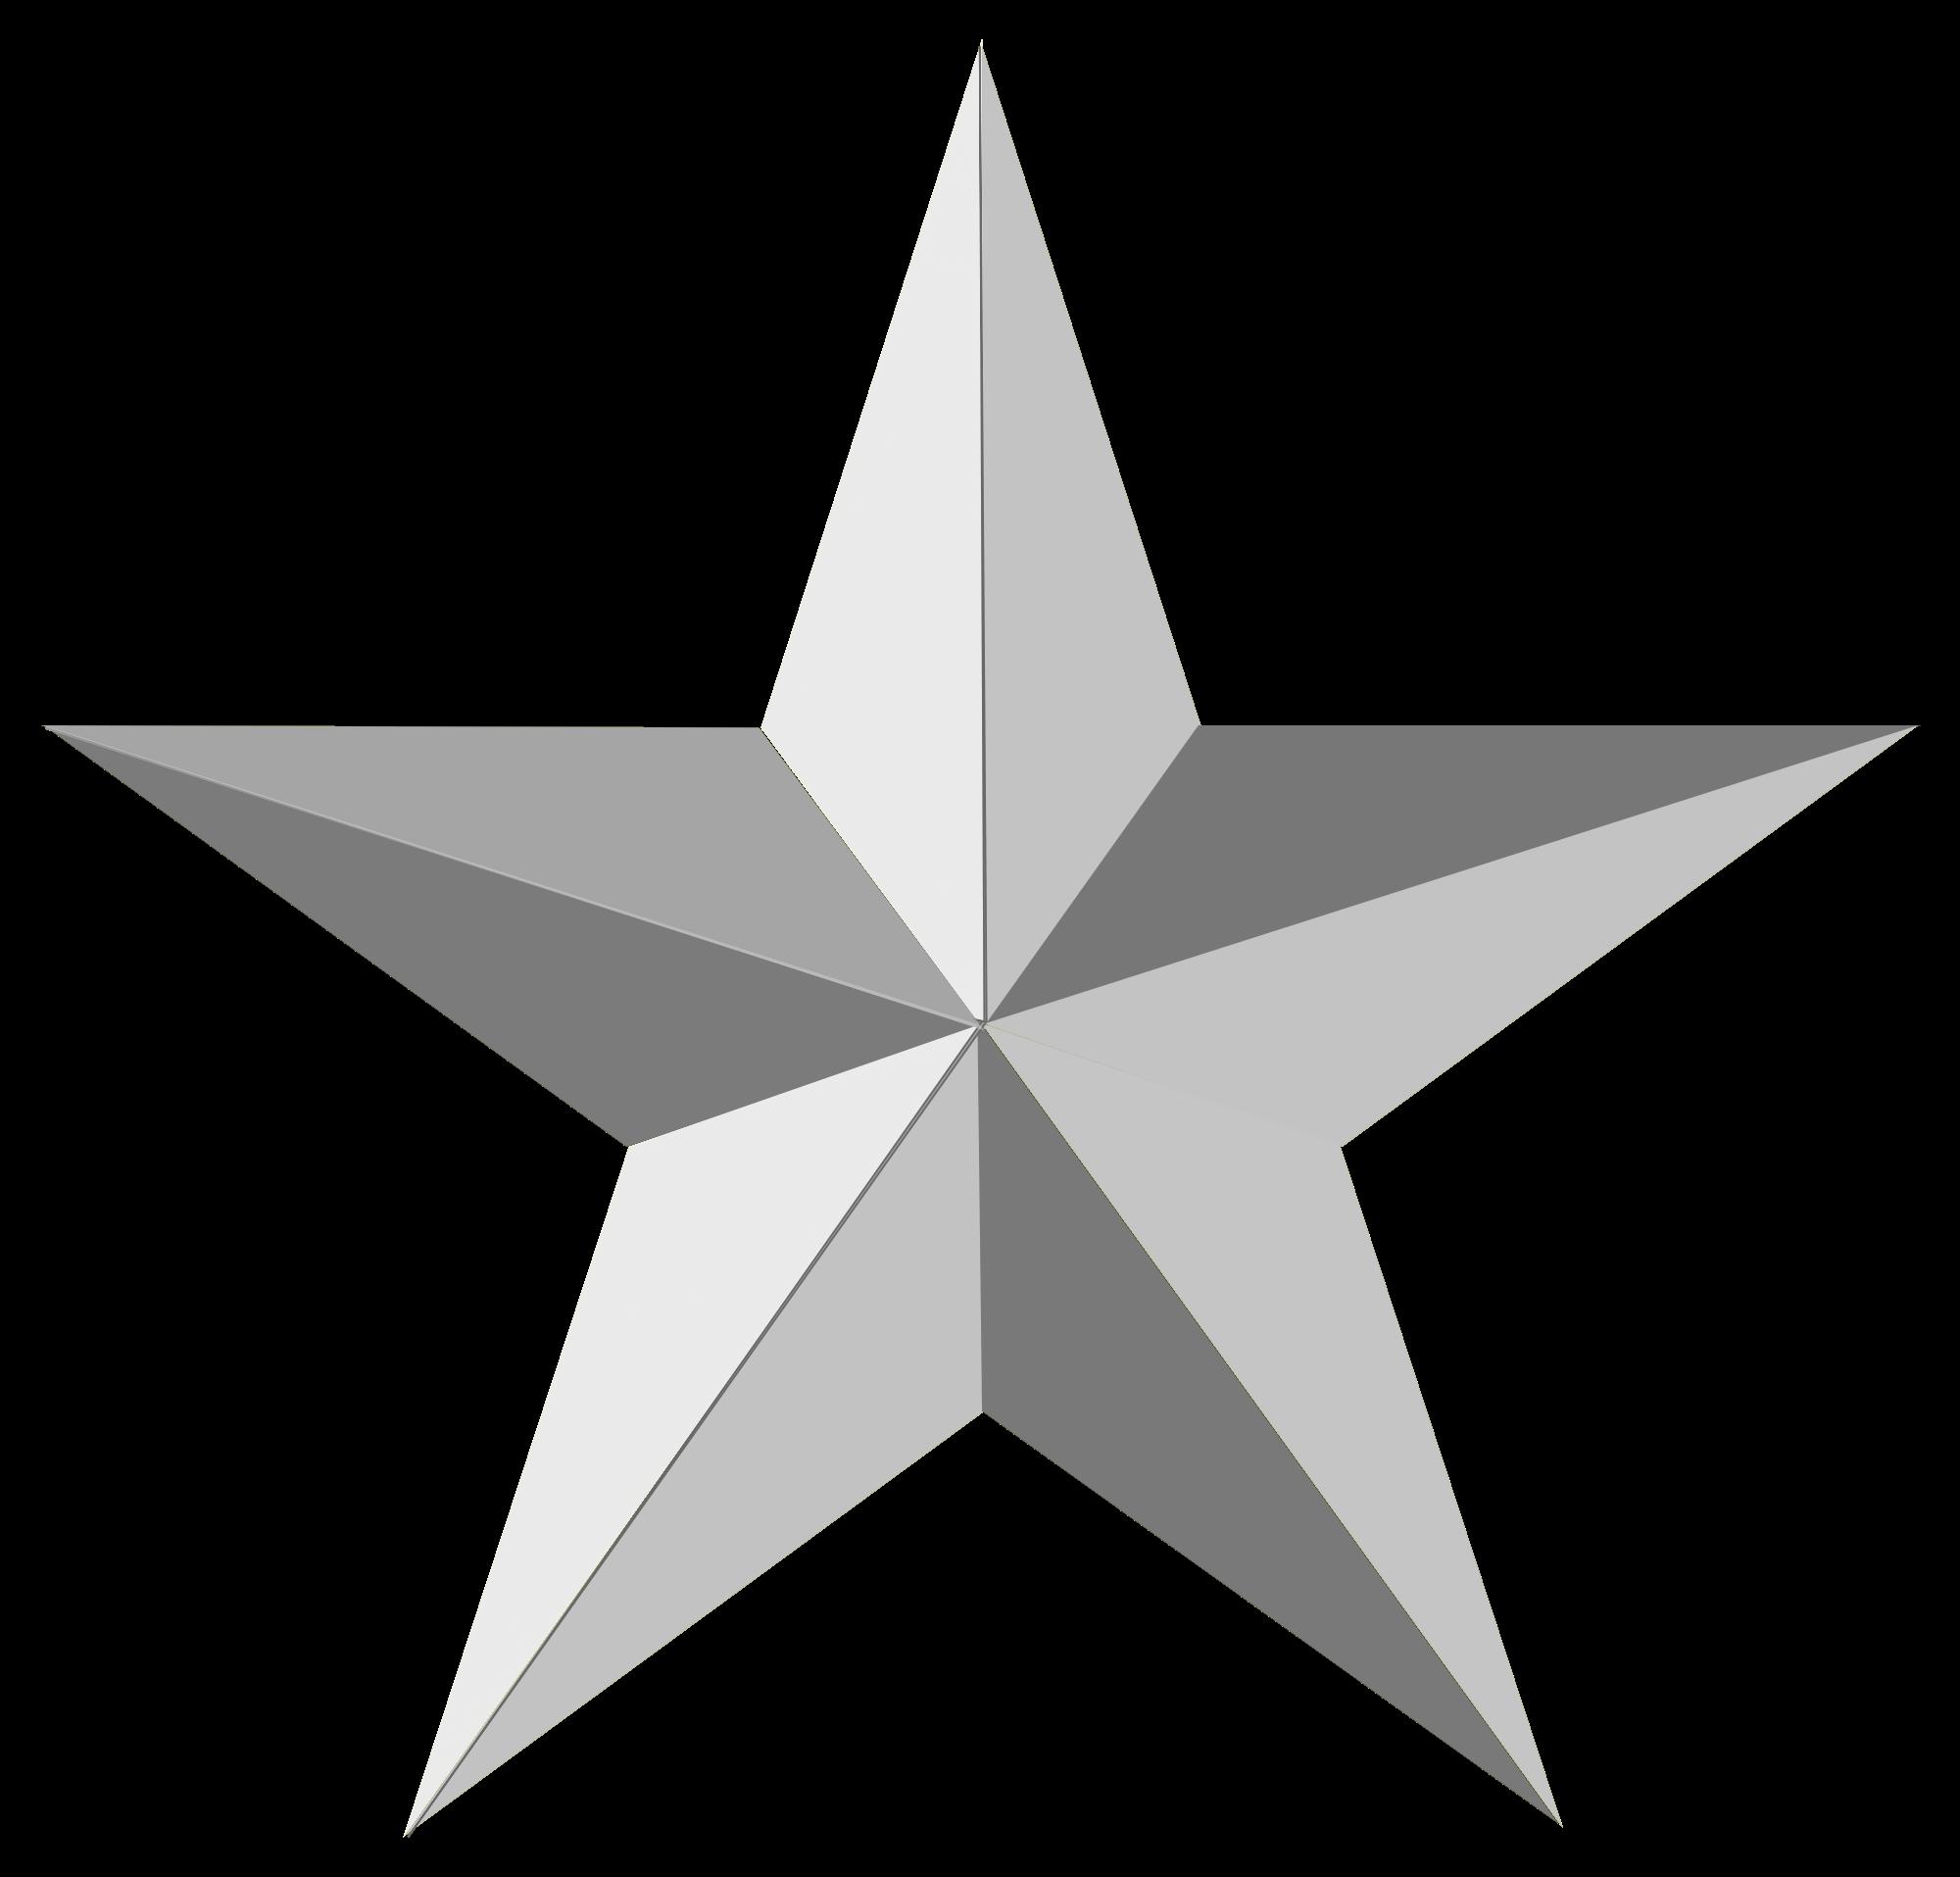 Star PNG Transparent image